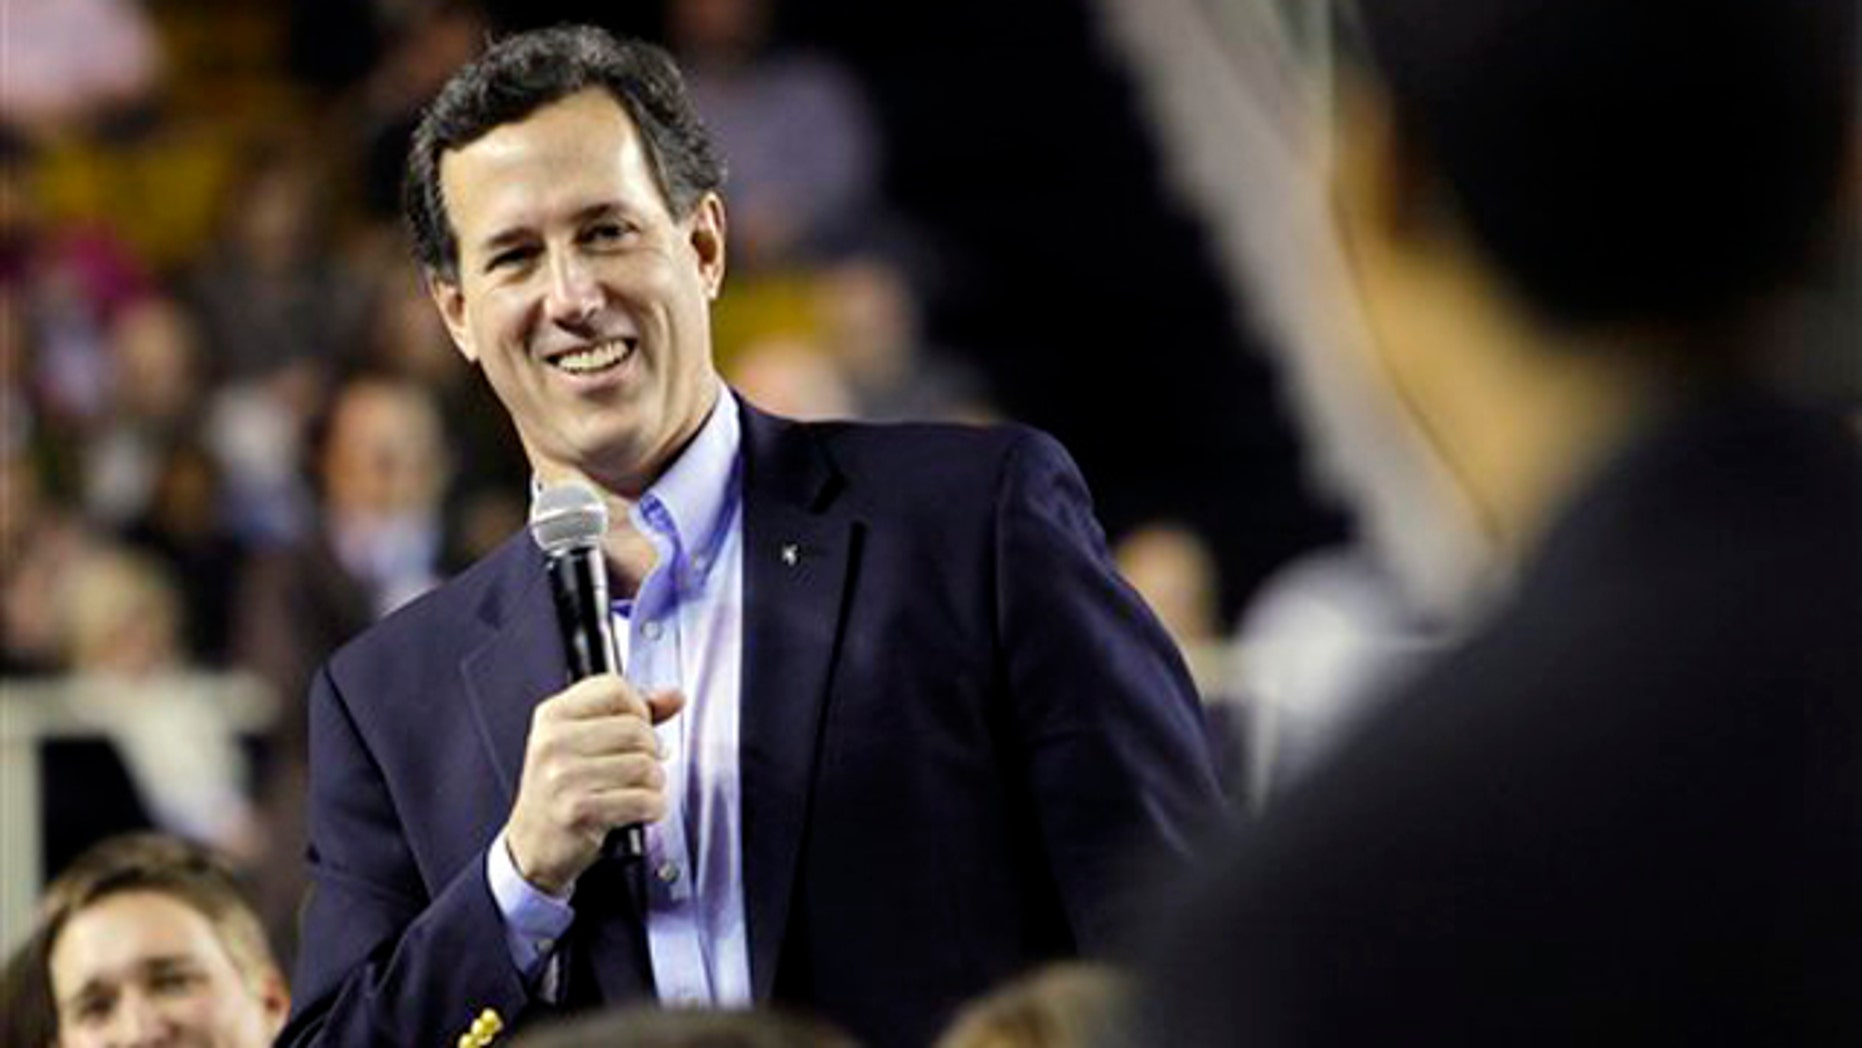 Feb. 9, 2012: Rick Santorum listens to a student's question at Oral Roberts University in Tulsa, Okla.